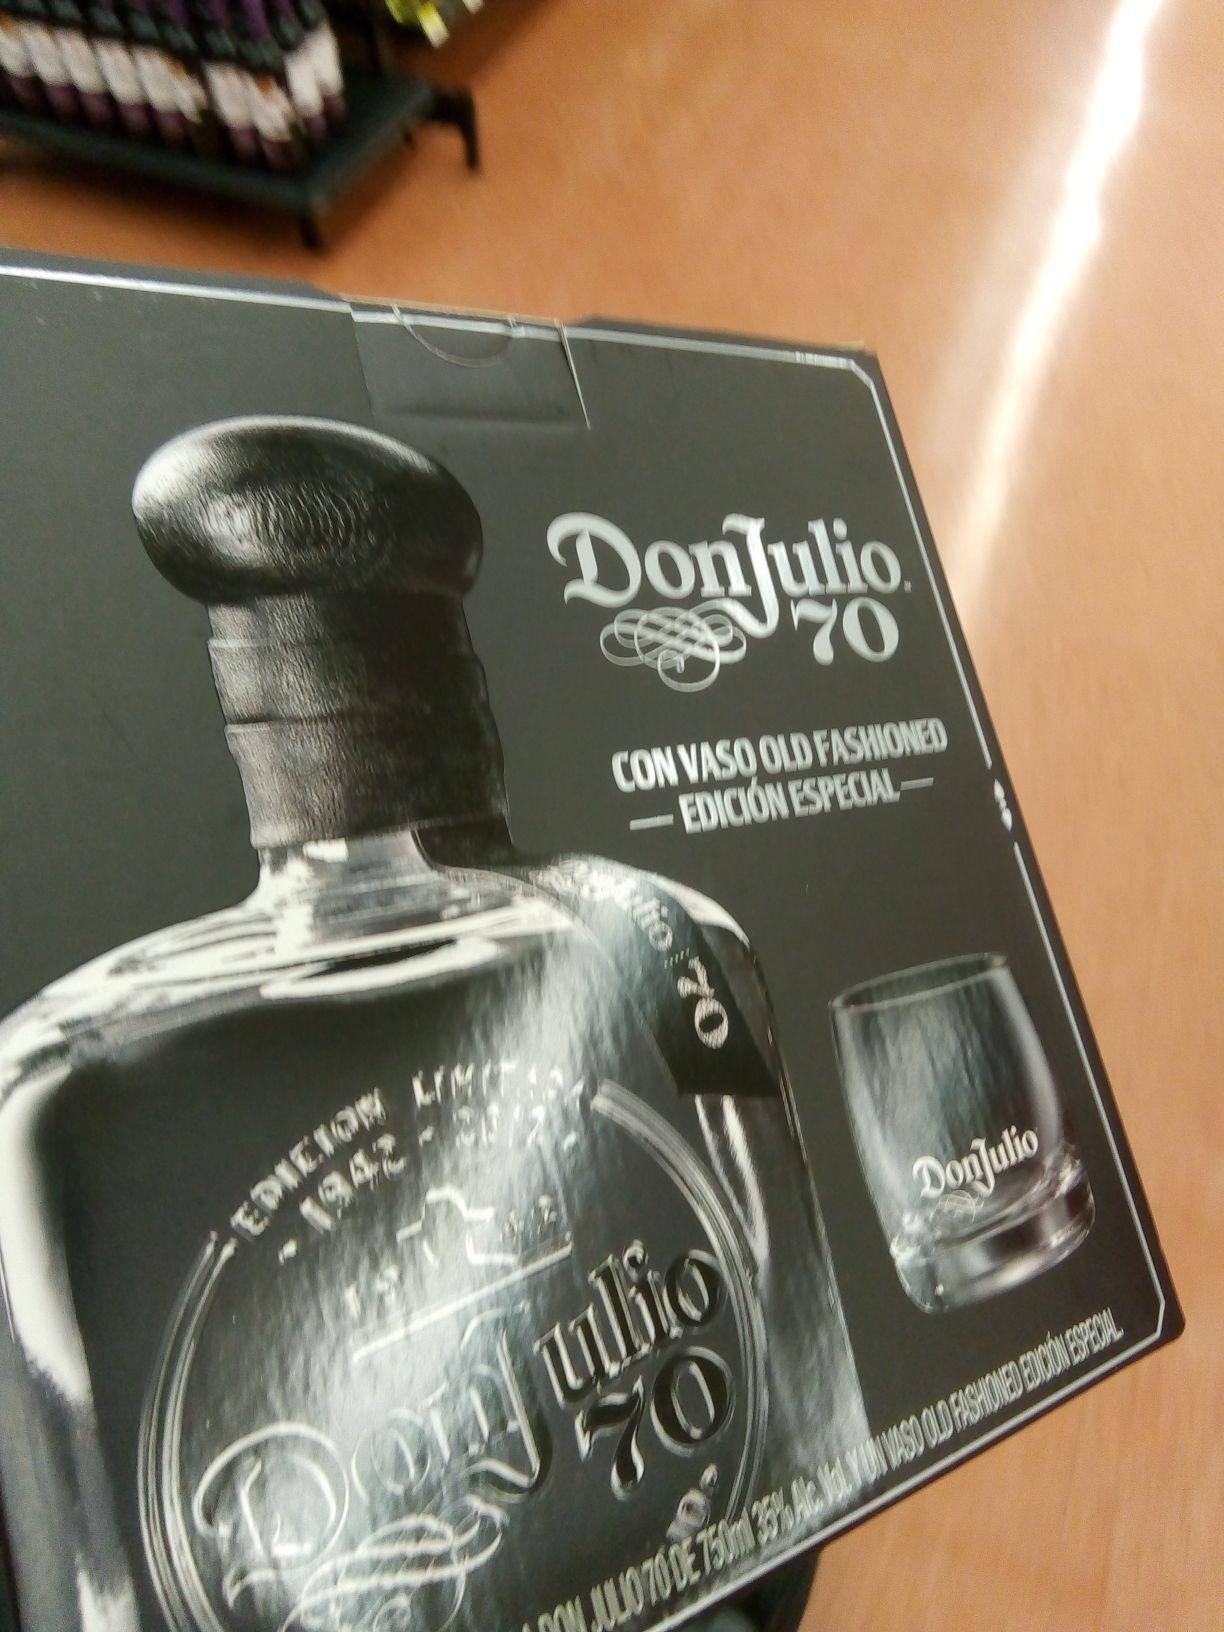 Walmart Montejo Mérida: Don julio 70 + vaso